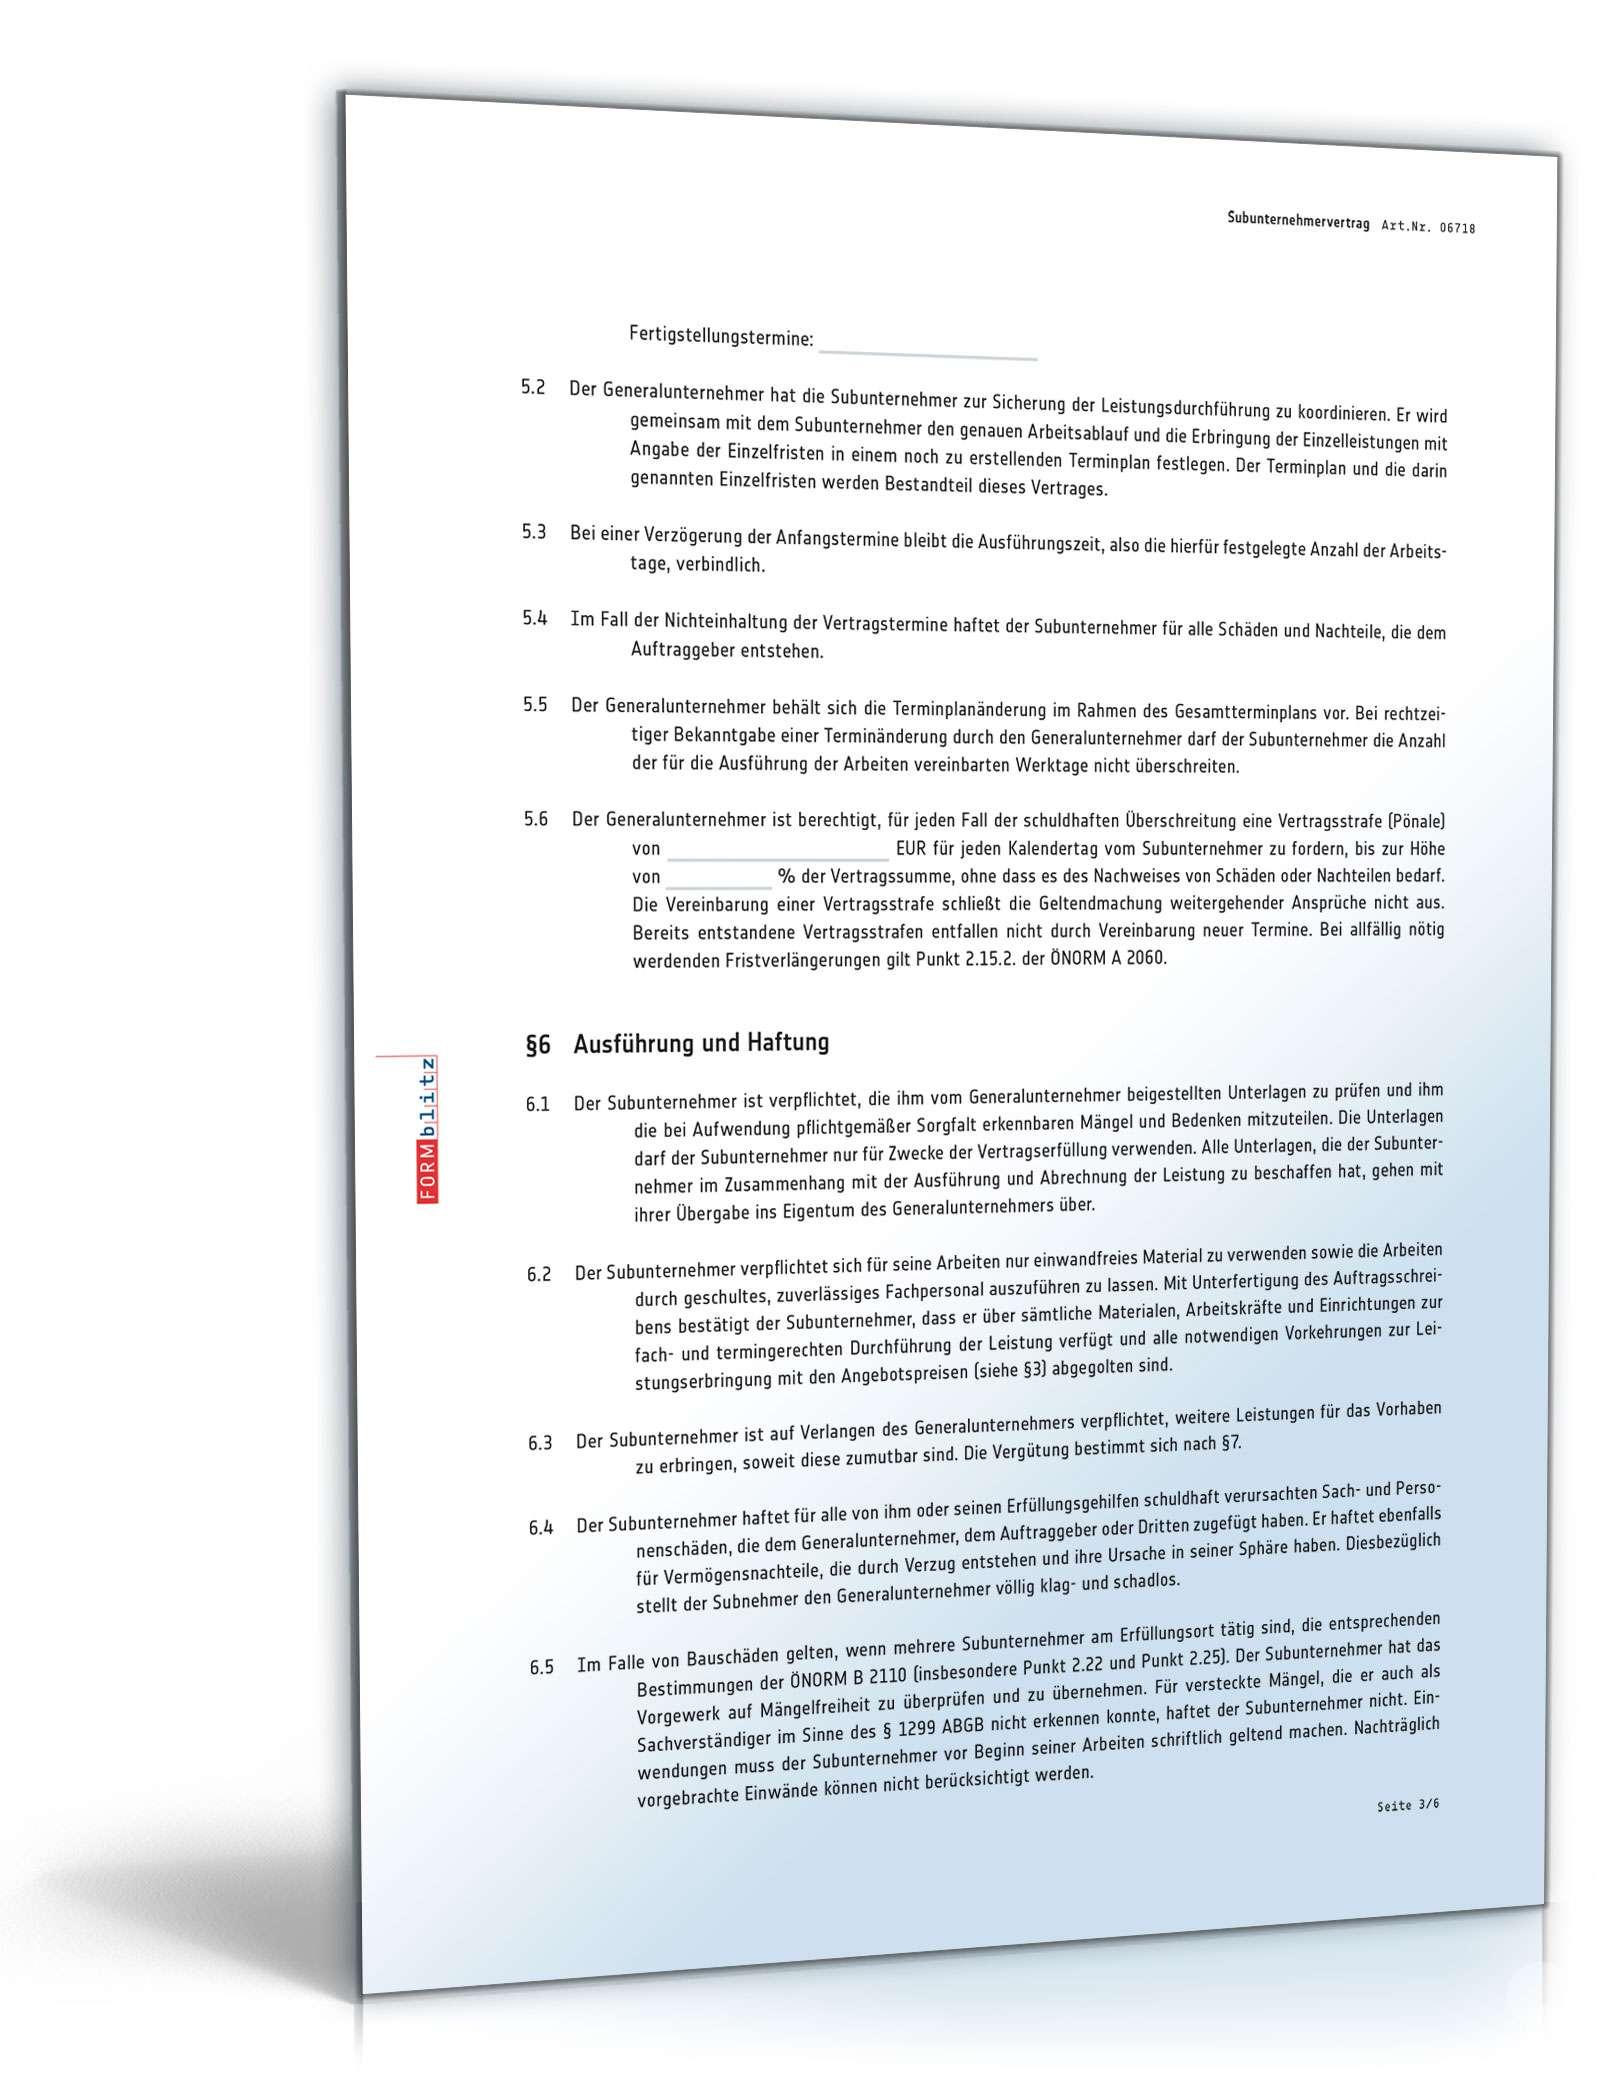 pdf seite 4 - Subunternehmervertrag Muster